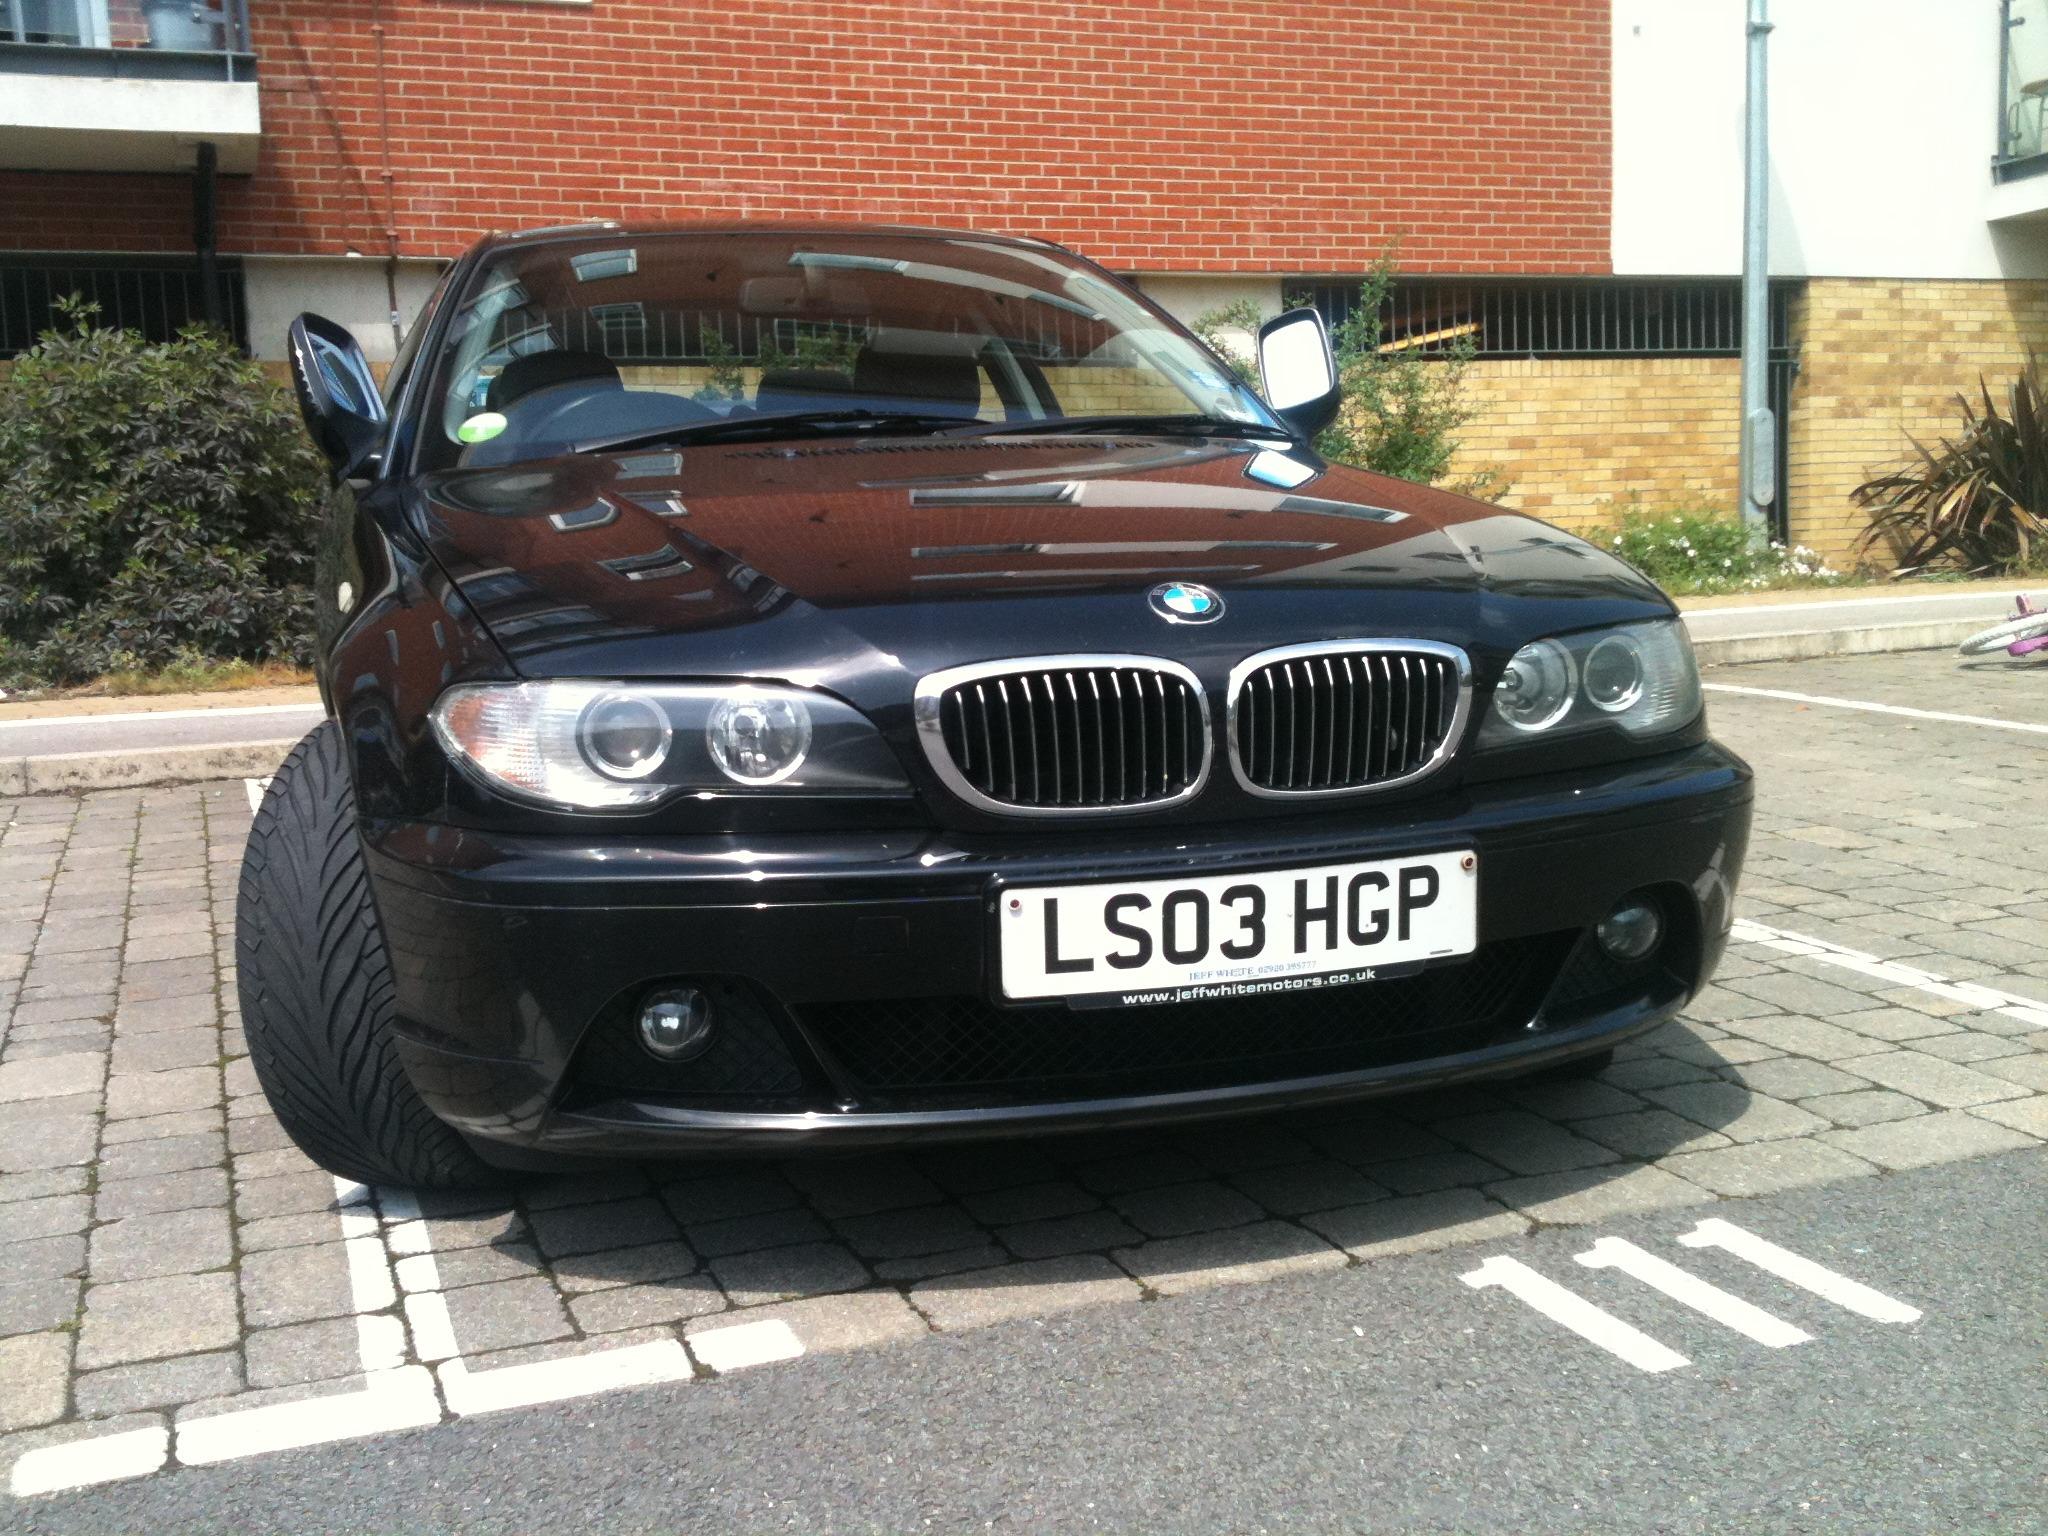 Free Images : wheel, black, classic car, sports car, bumper ...